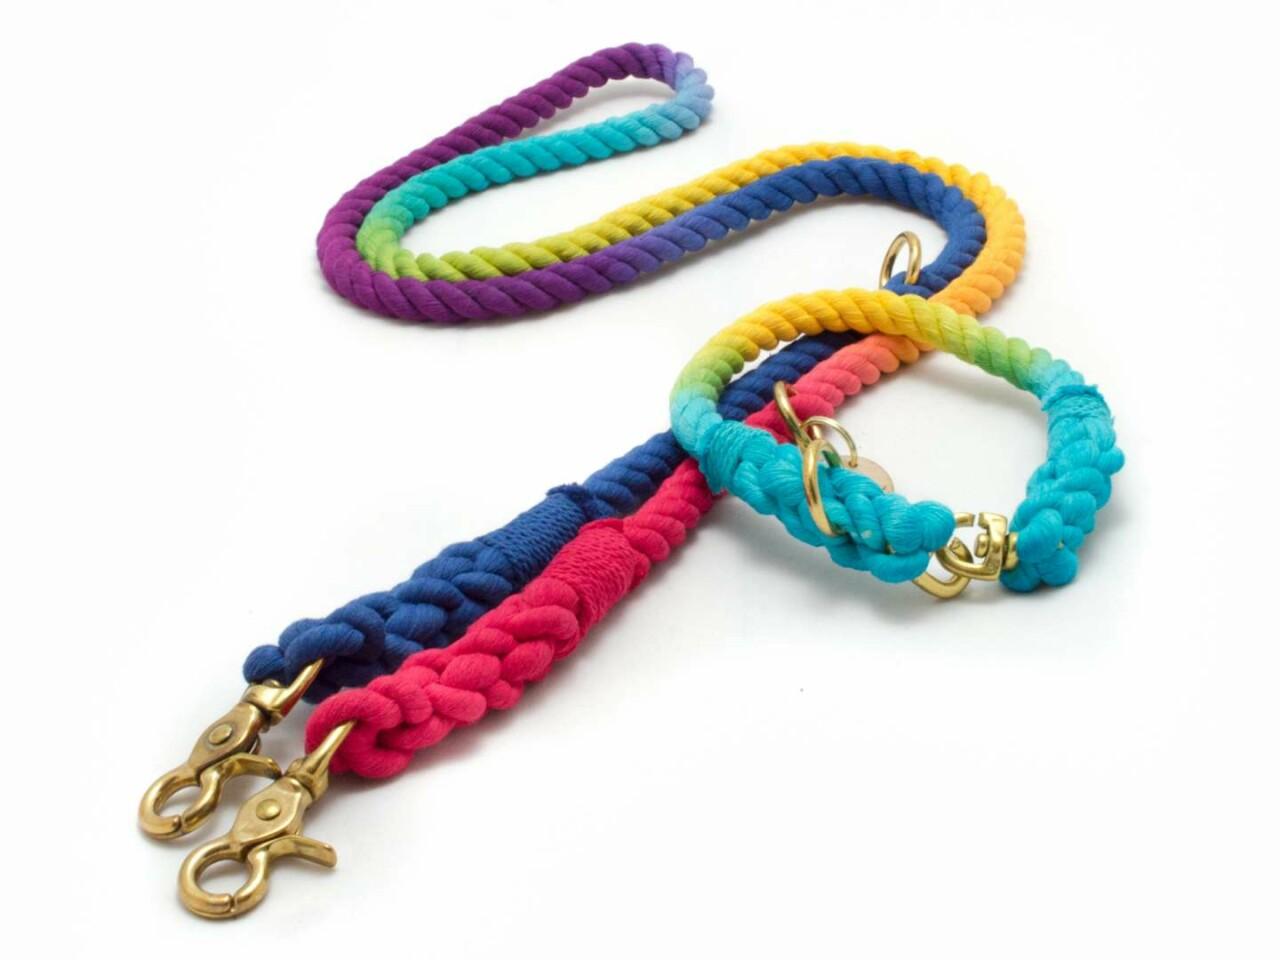 Tauleine & Tauhalsband Rainbow für Hunde - taukunst Manufaktur